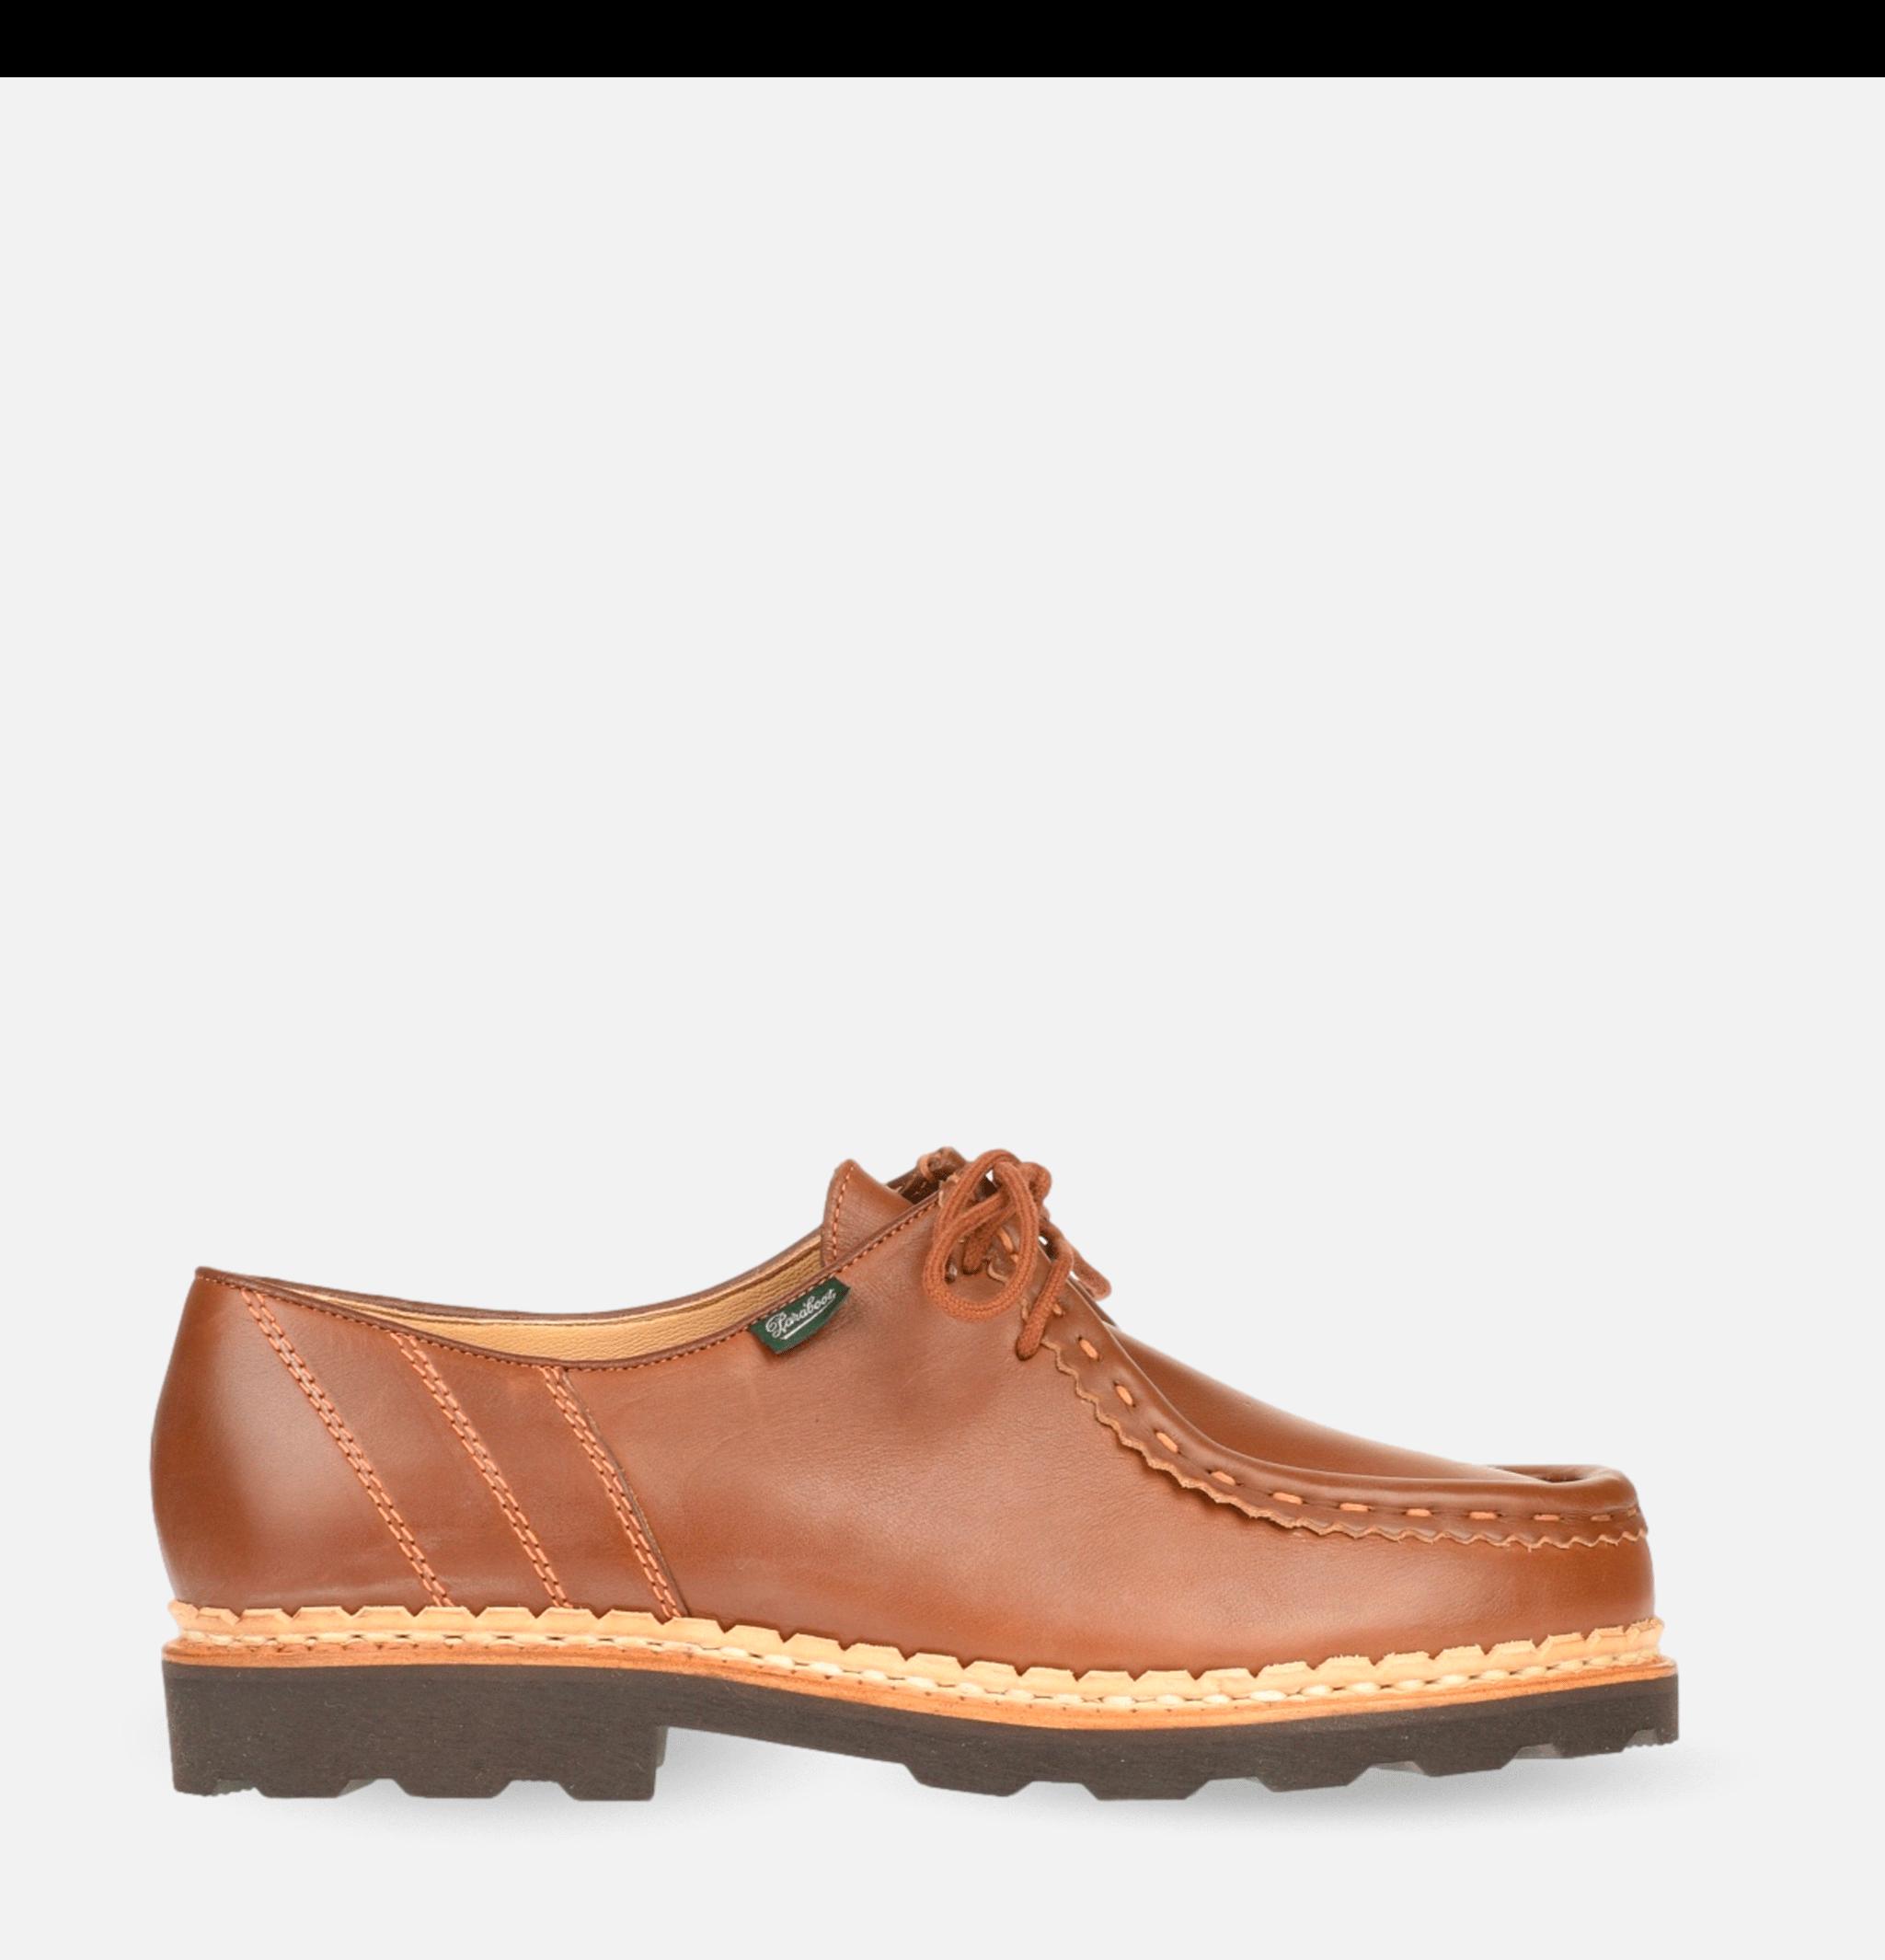 Chaussures Morzine Marron